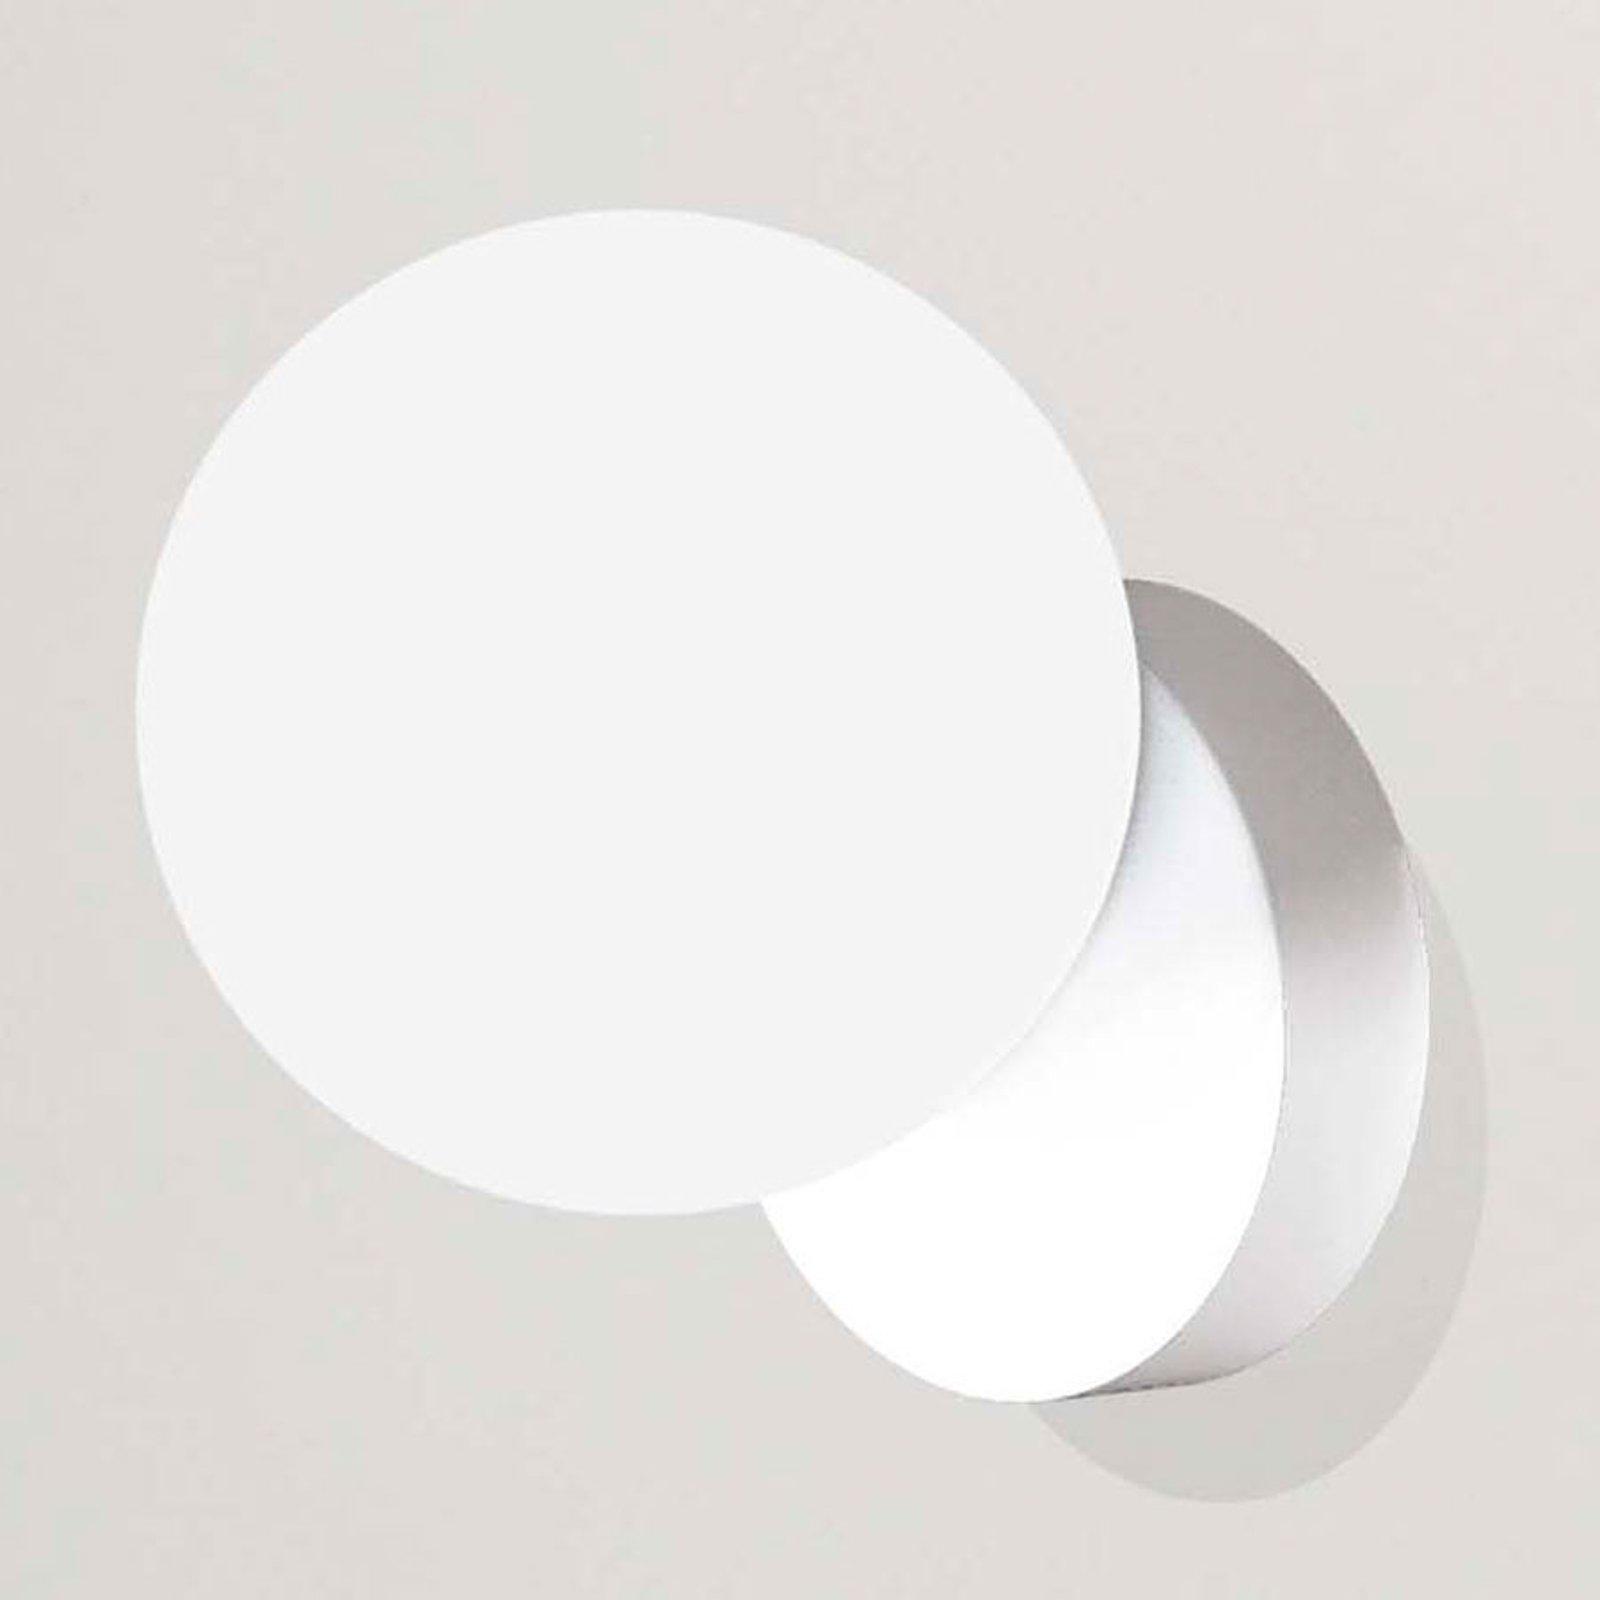 Tin Tin vegglampe 1 lyskilde hvit